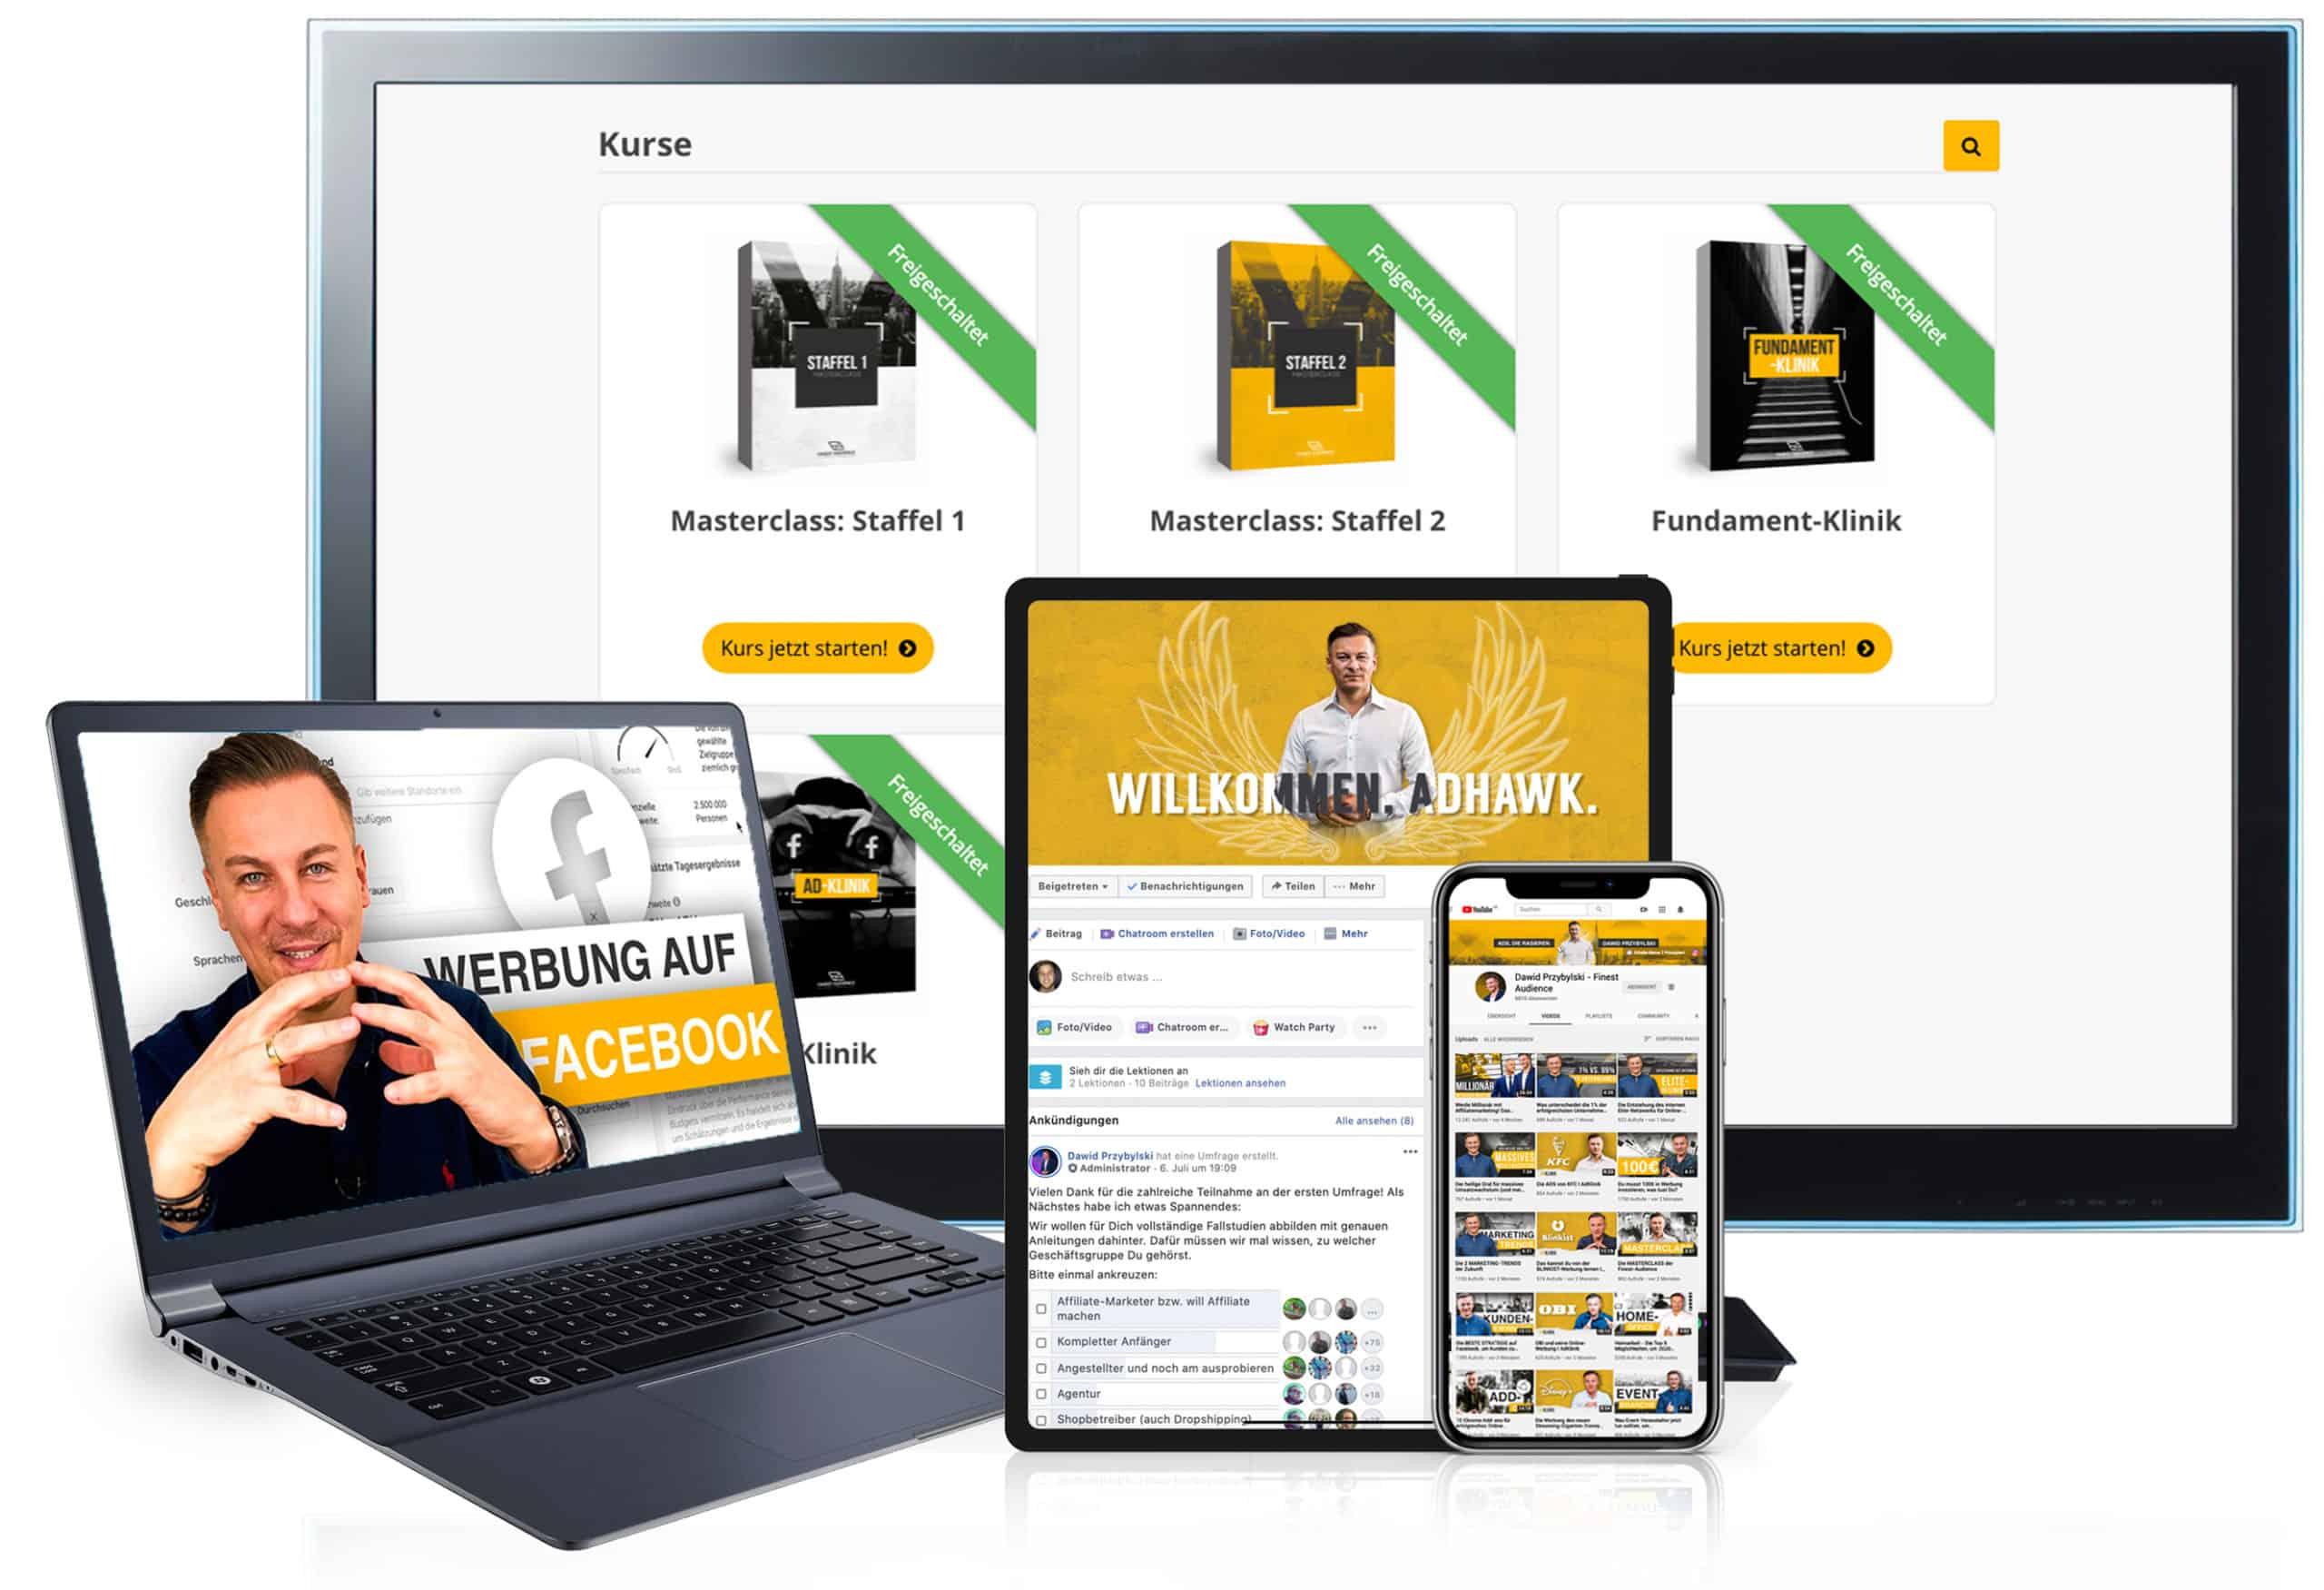 Website Geräte 1 scaled Finest Audience by Dawid Przybylski - Facebook Marketing - Instagram Marketing